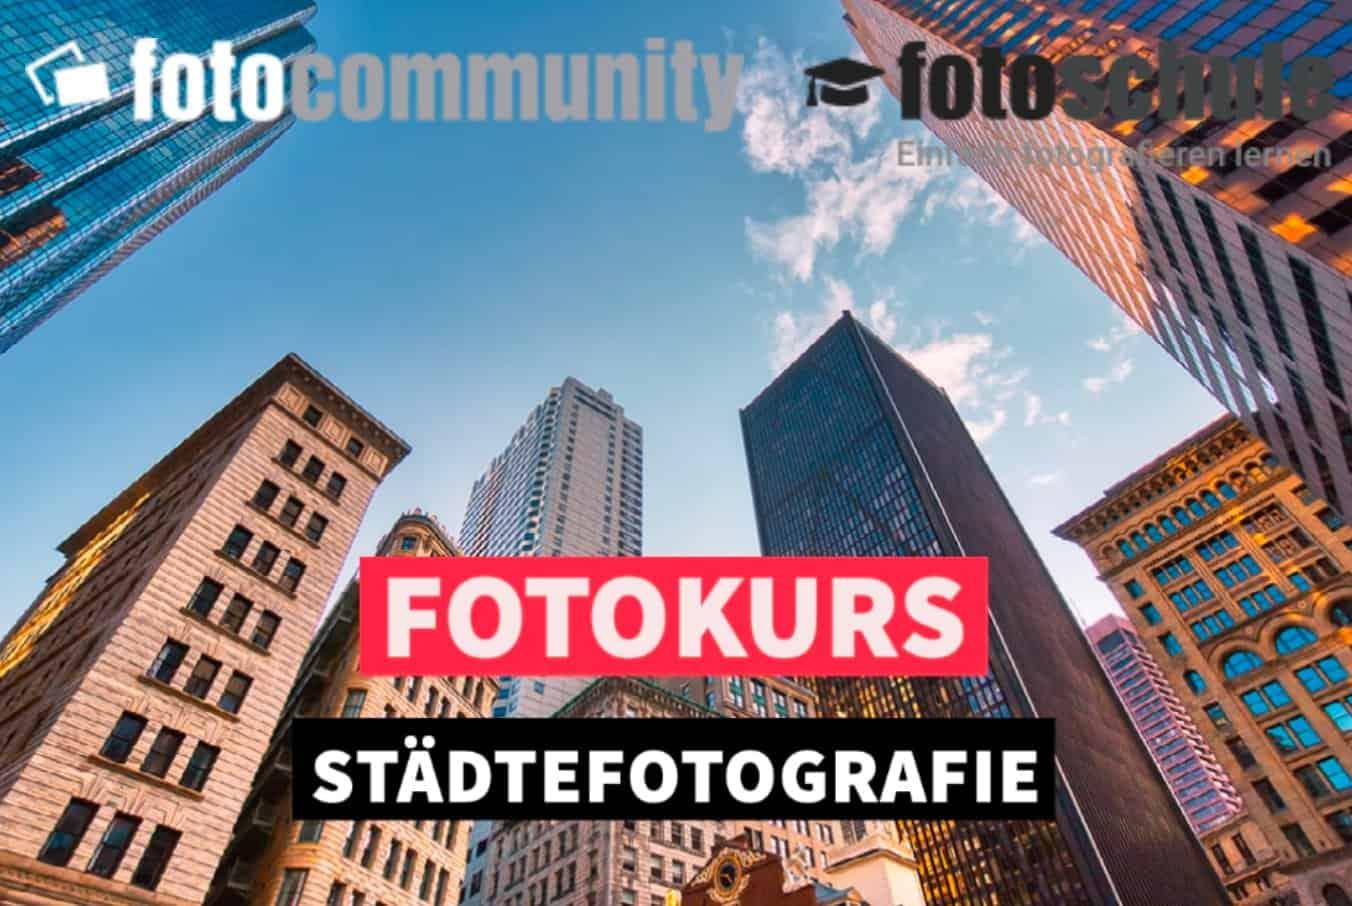 Bildschirmfoto Städtefotografie mit Logos